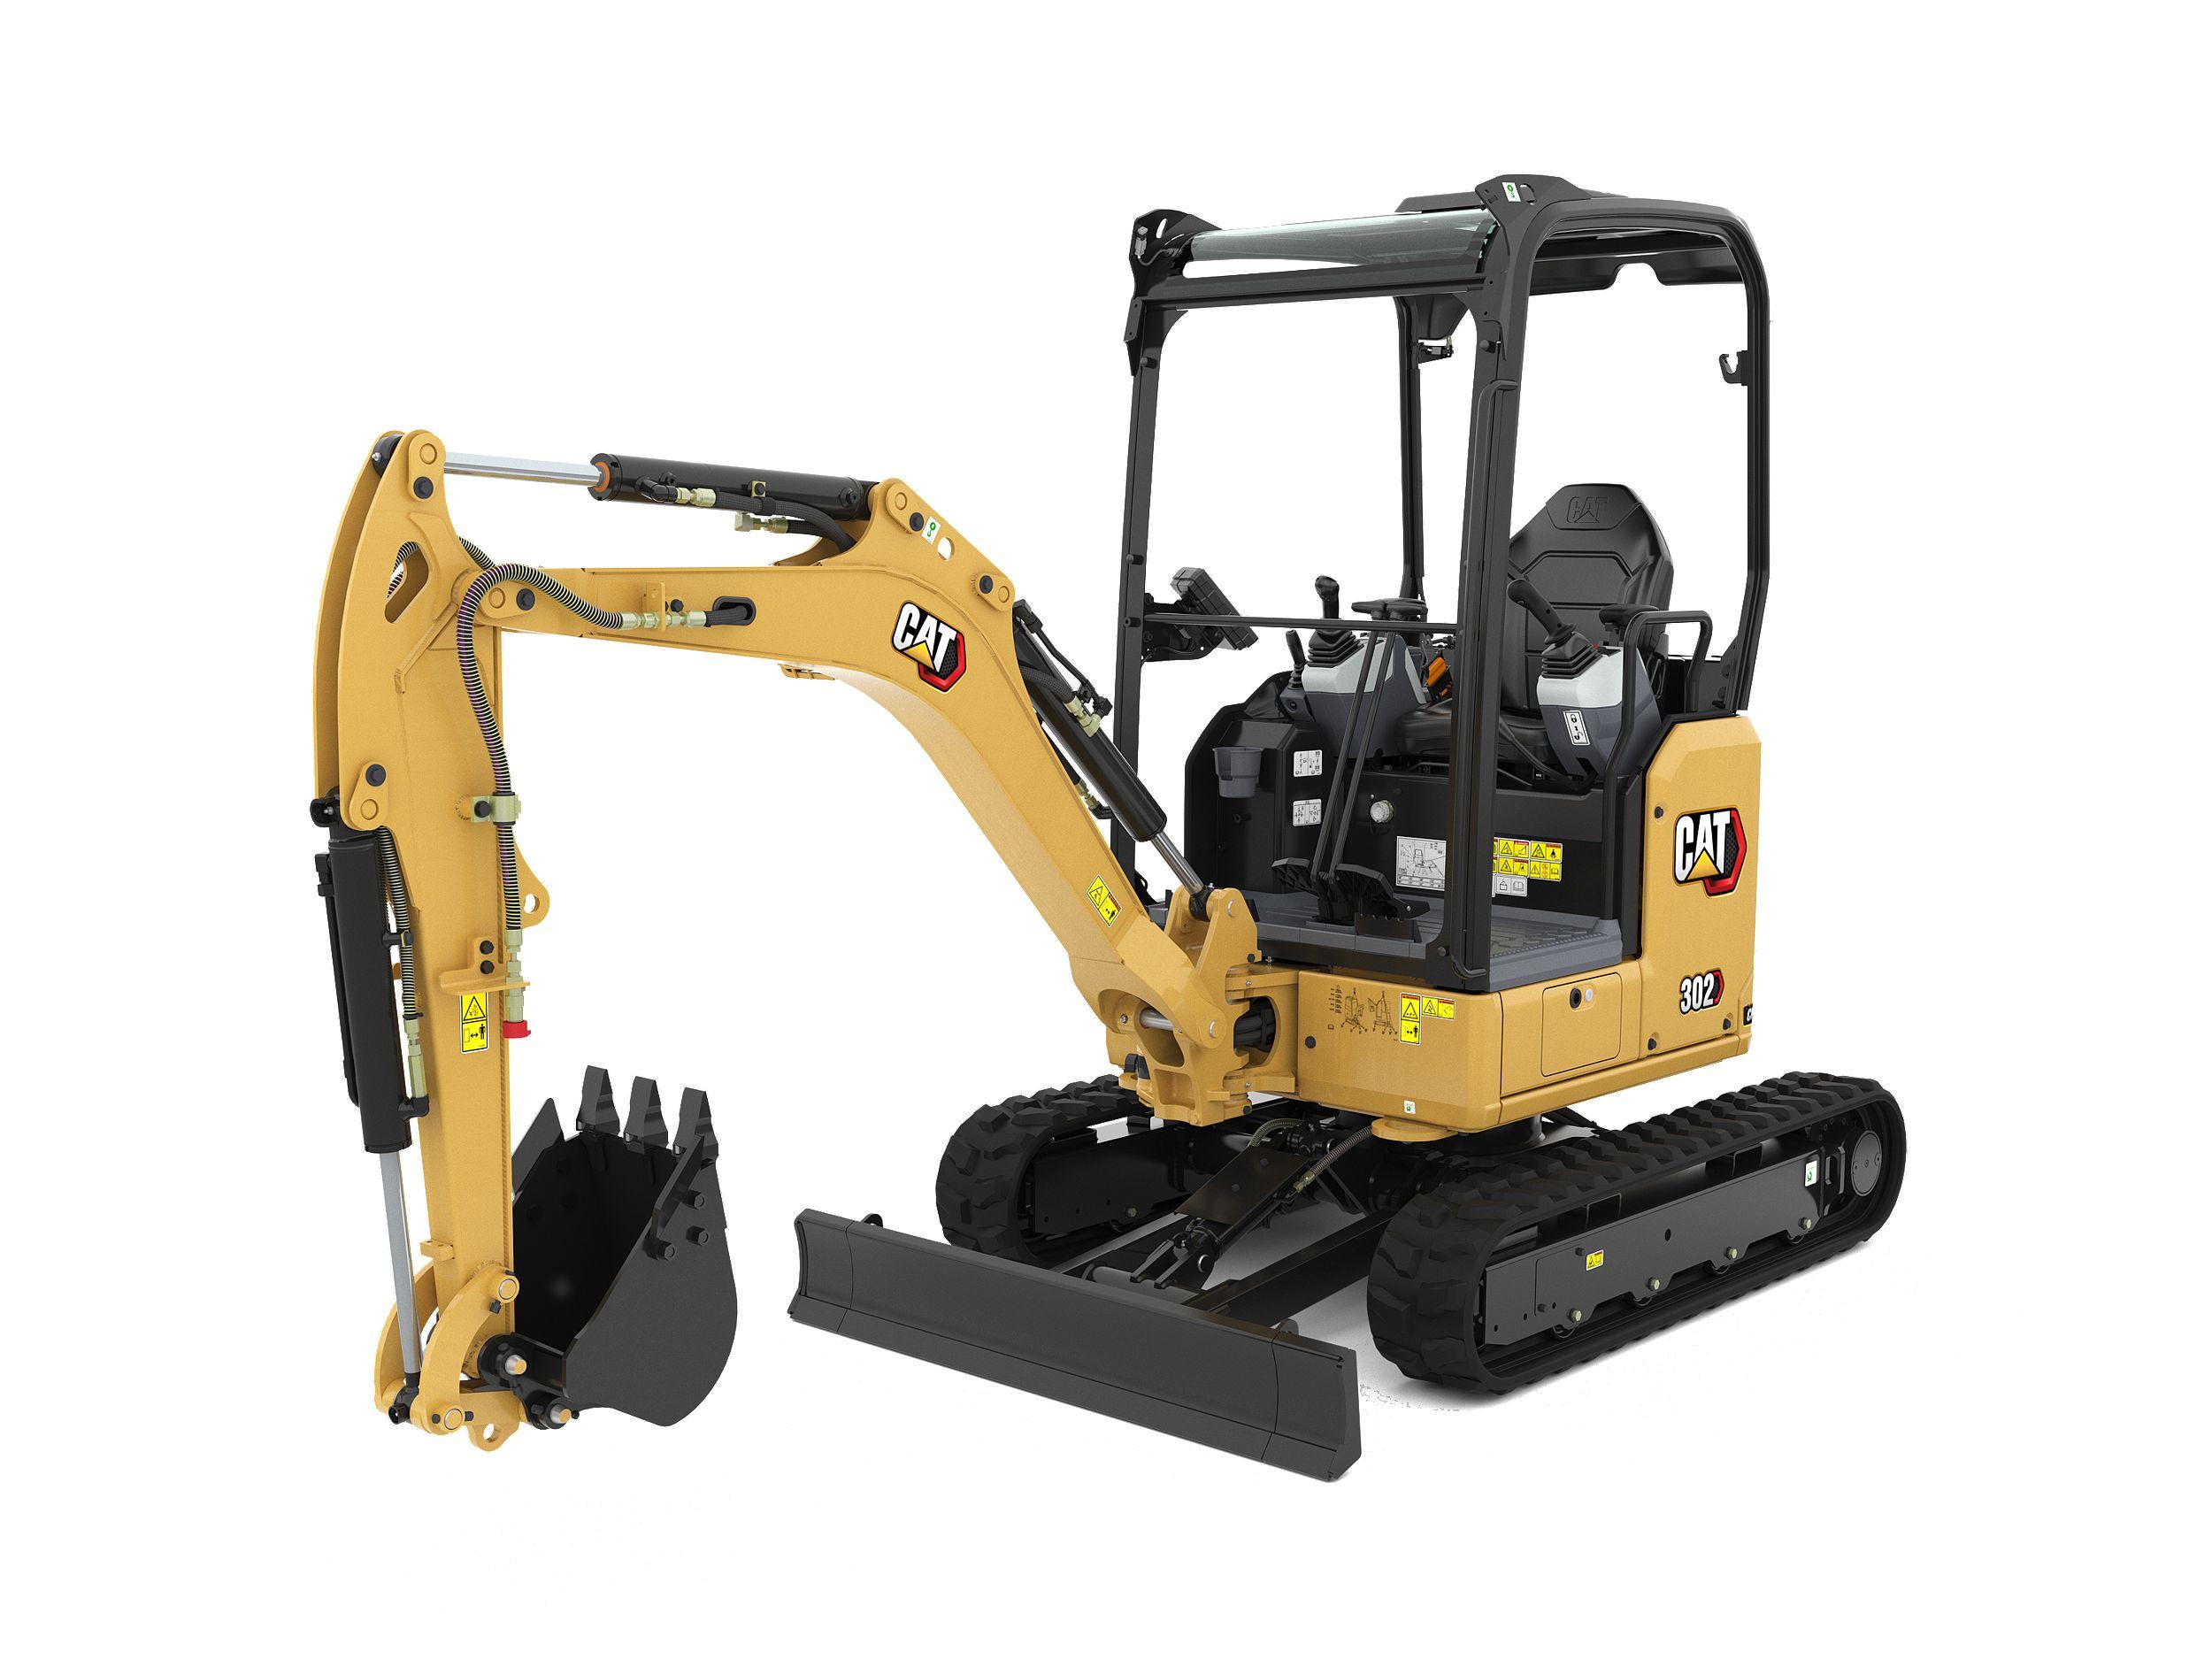 302 CR Mini Hydraulic Excavator